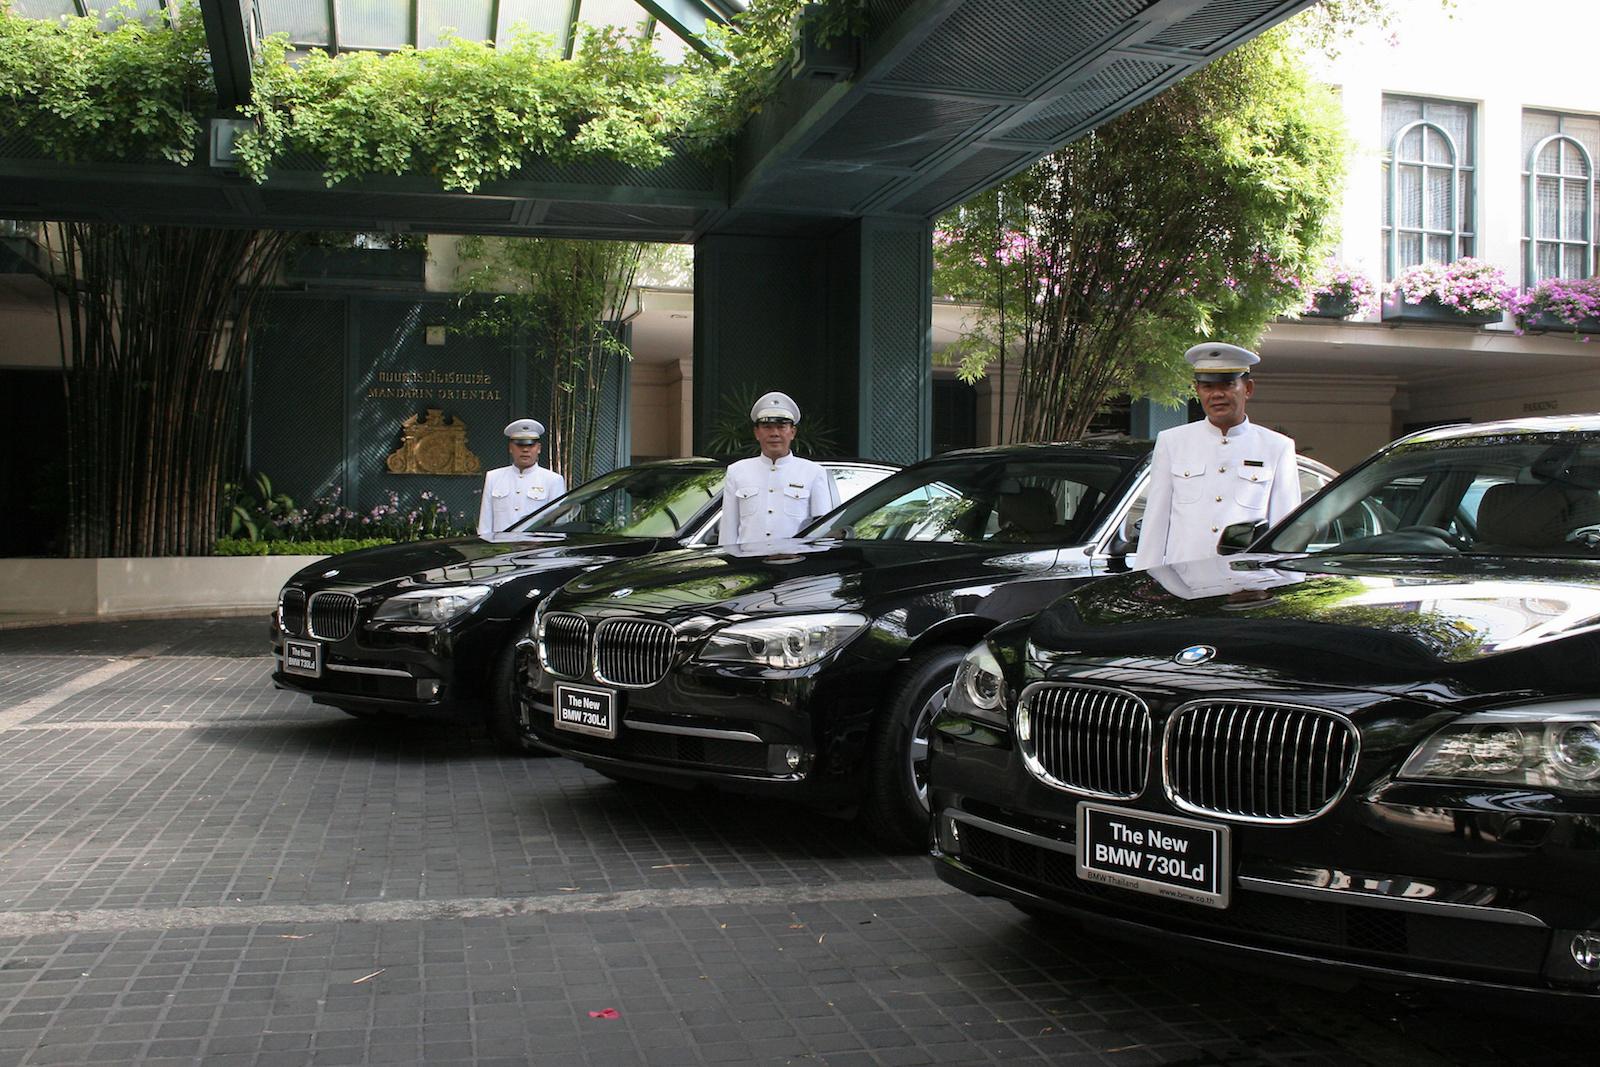 bangkok 5 star hotel limousine service